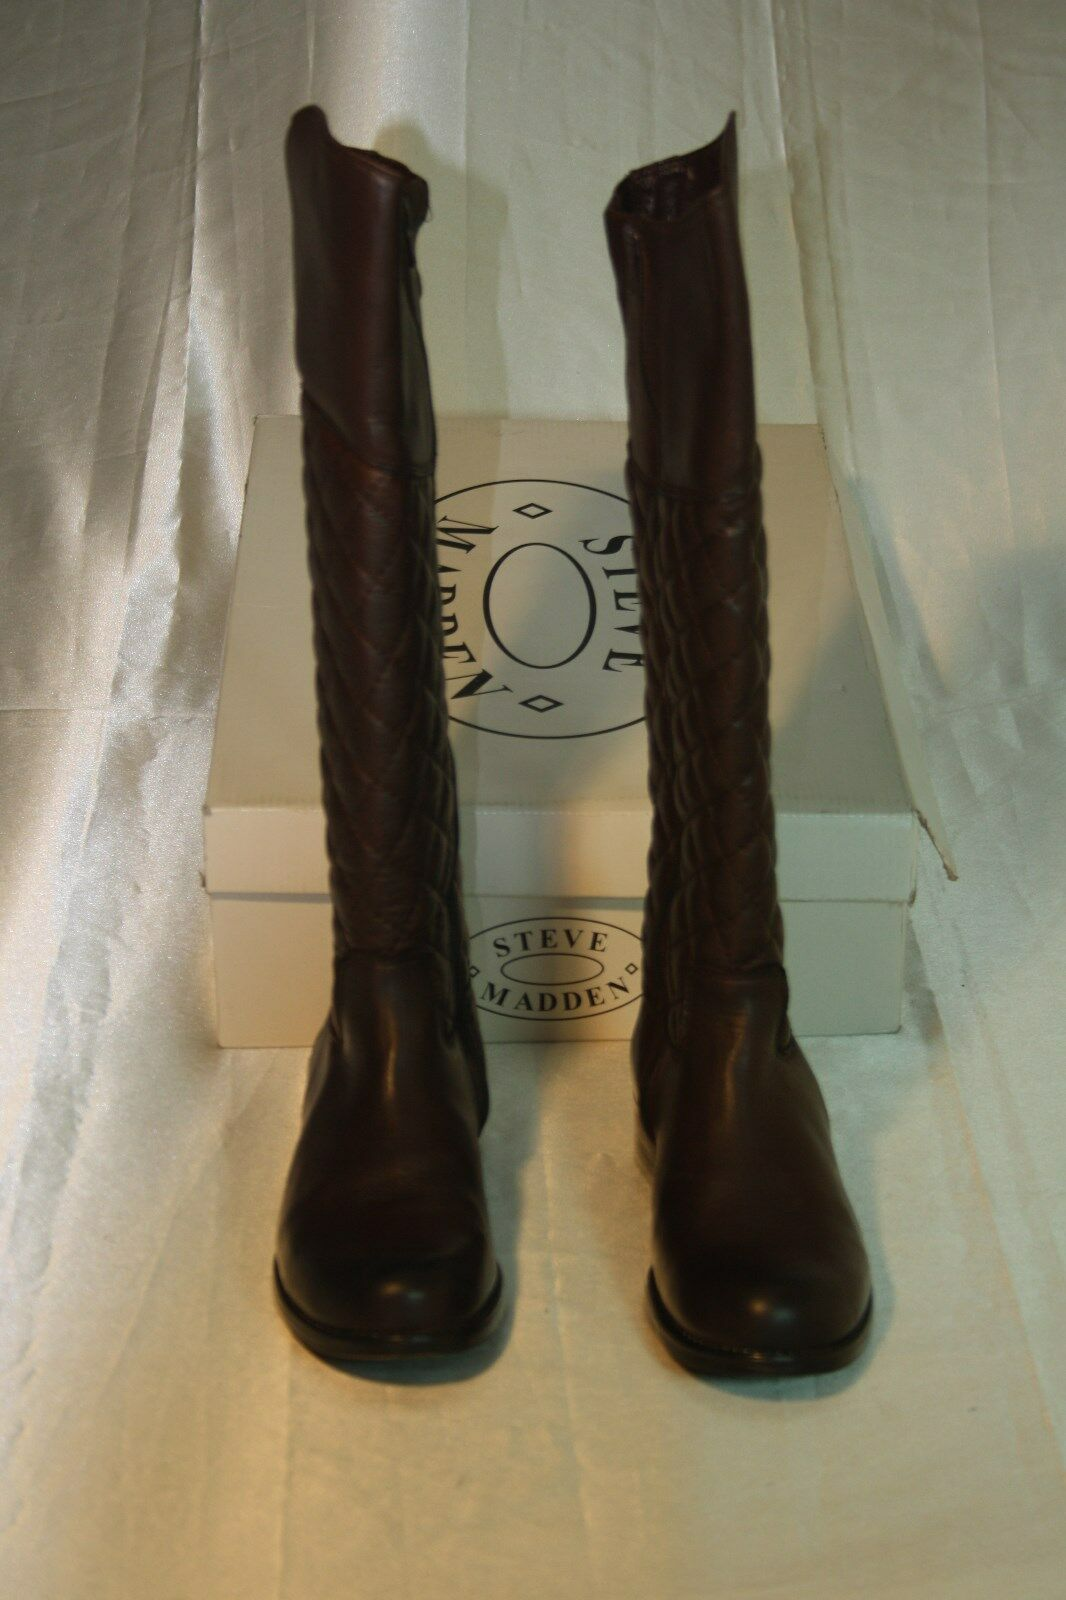 New Steve Madden Women's Brown Leather Reggo Boots Size: Us 6 Eur 37